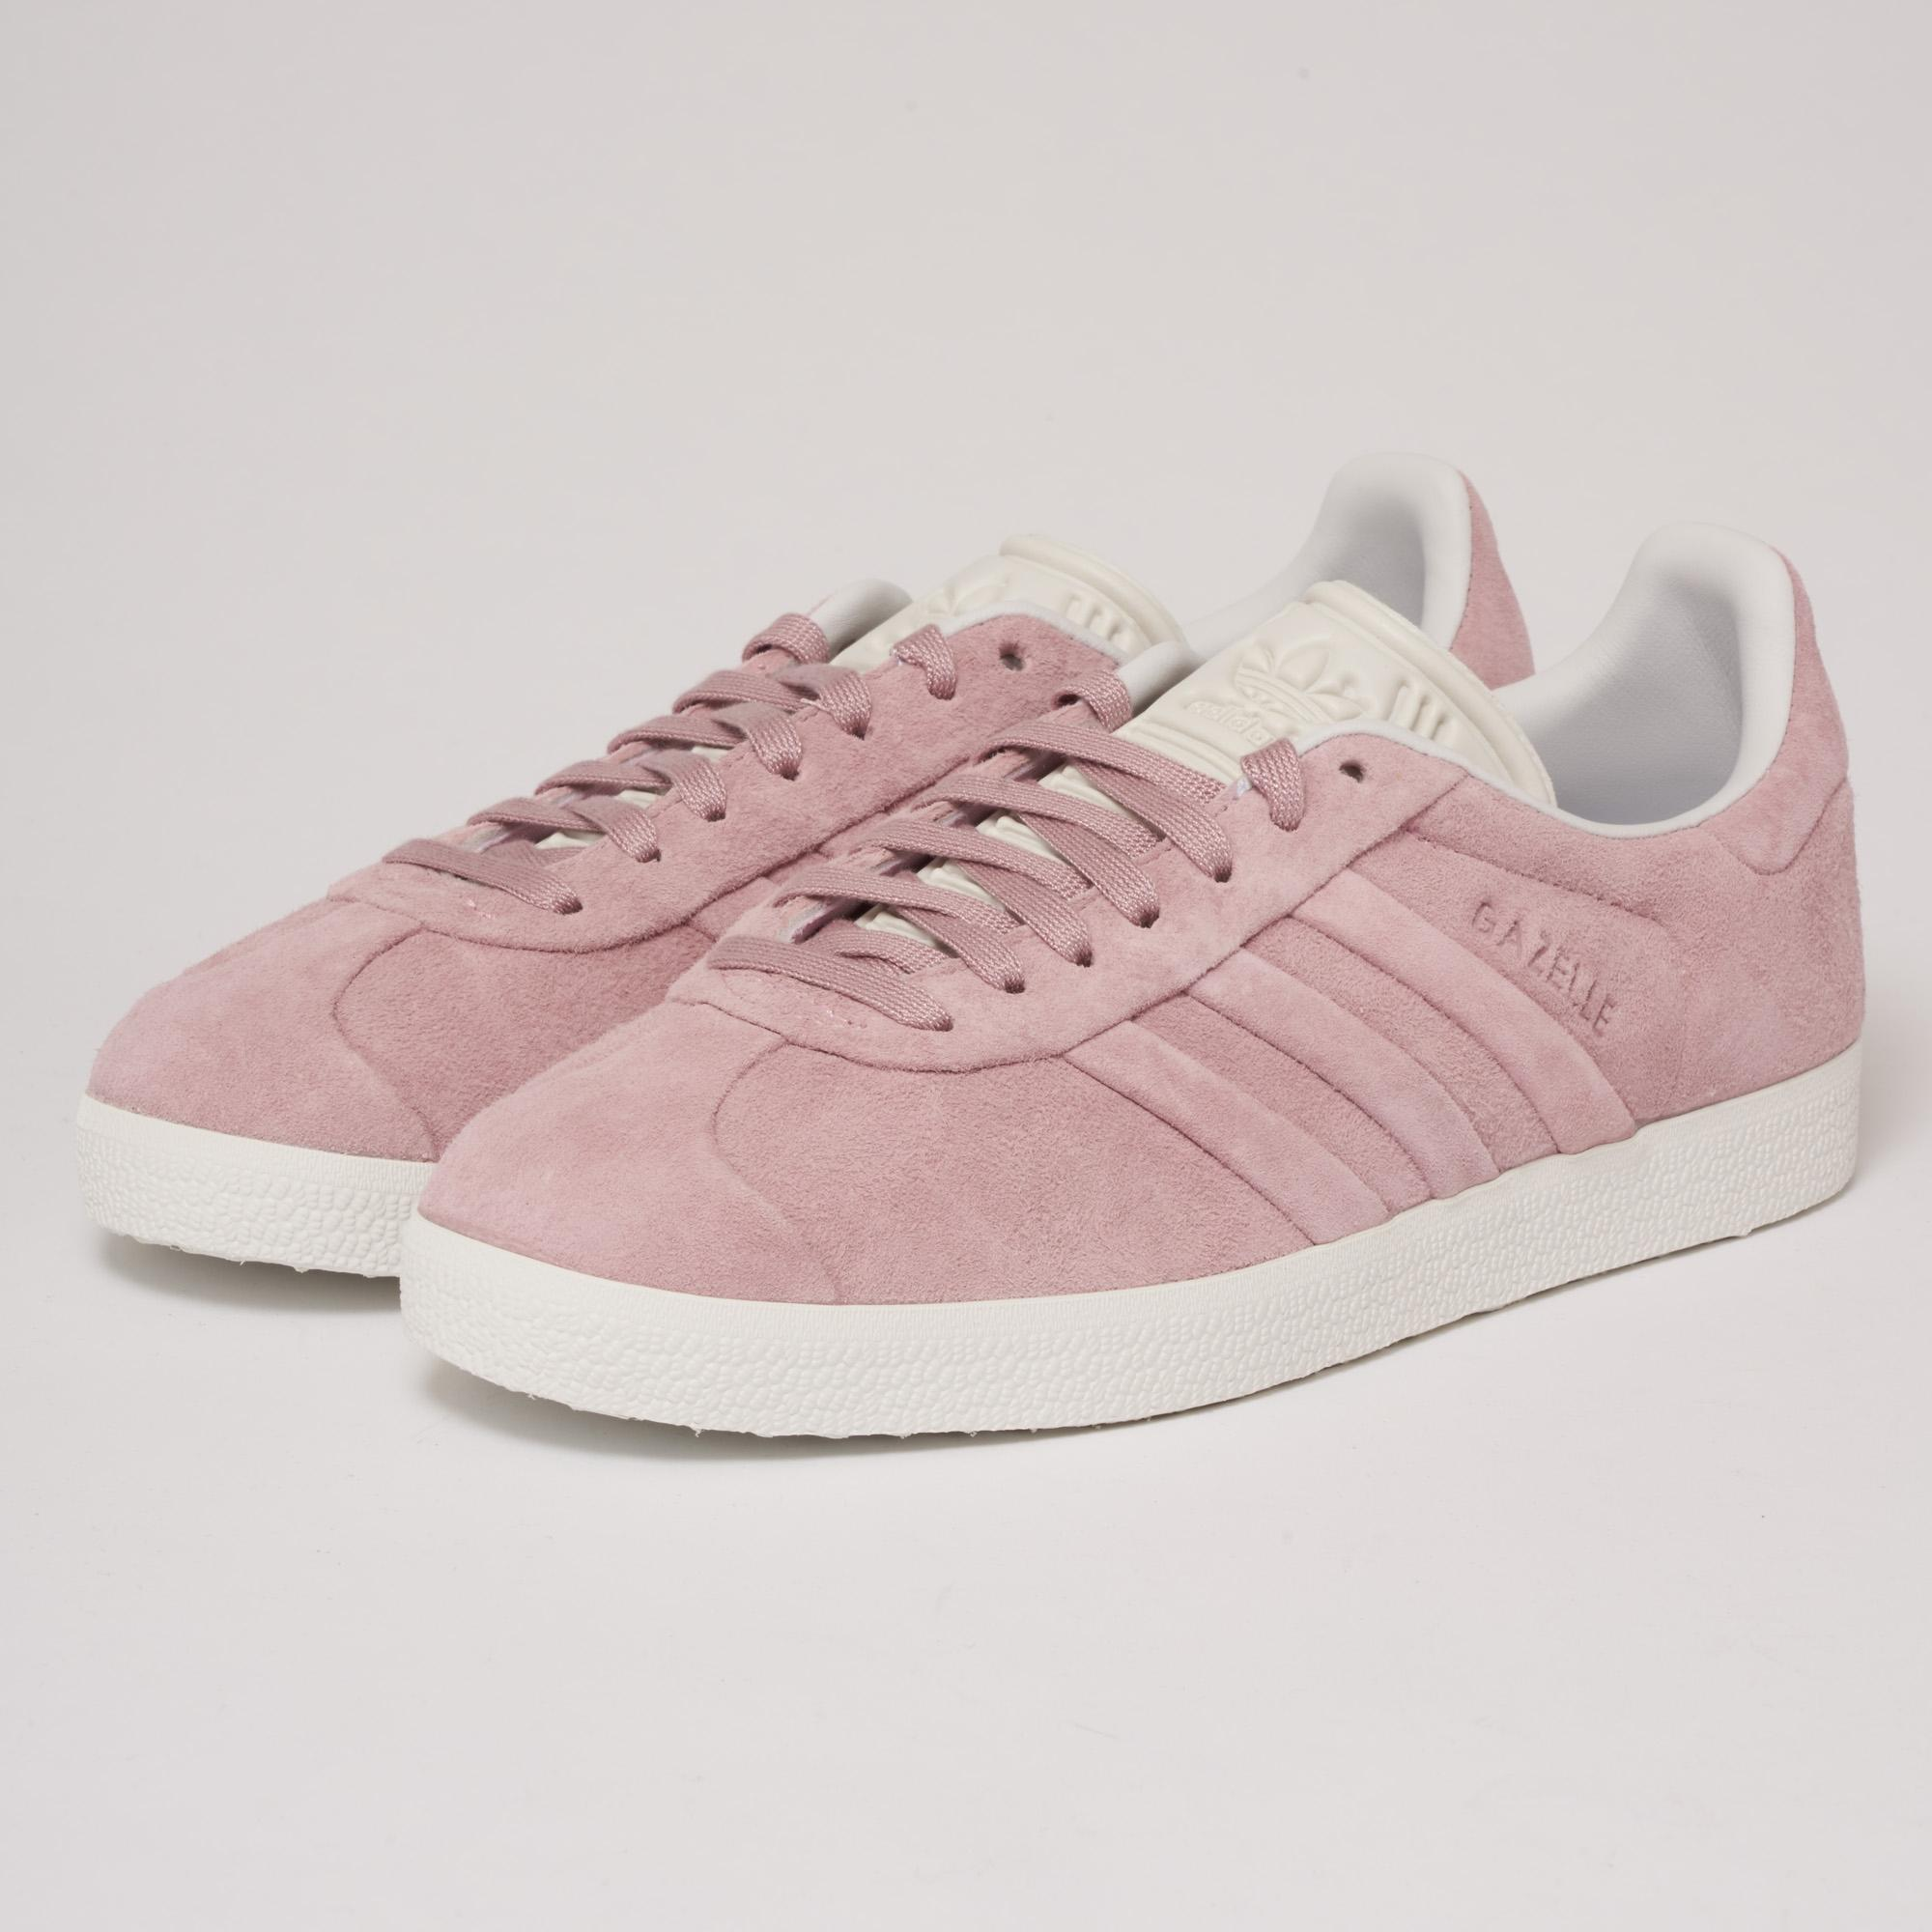 GAZELLE STICHT AND TURN W - FOOTWEAR - Low-tops & sneakers adidas O74t4ard